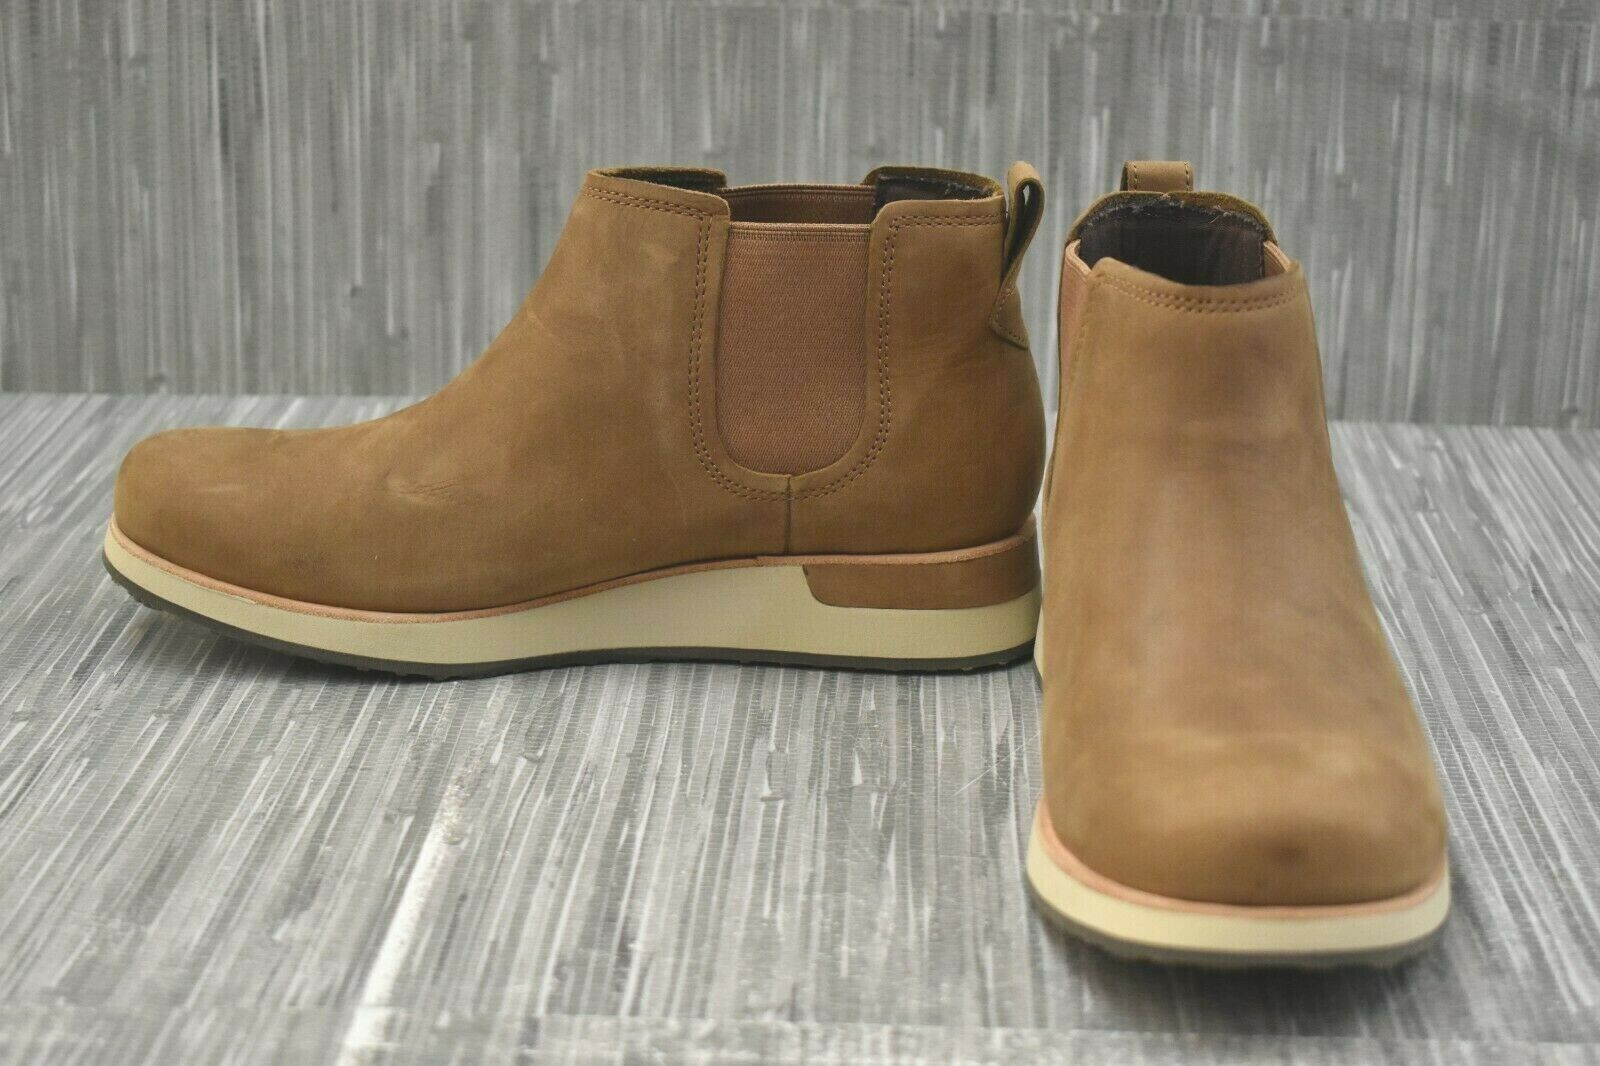 Merrell Roam Chelsea J17406 Boots, Women's Size 8.5, Tobacco